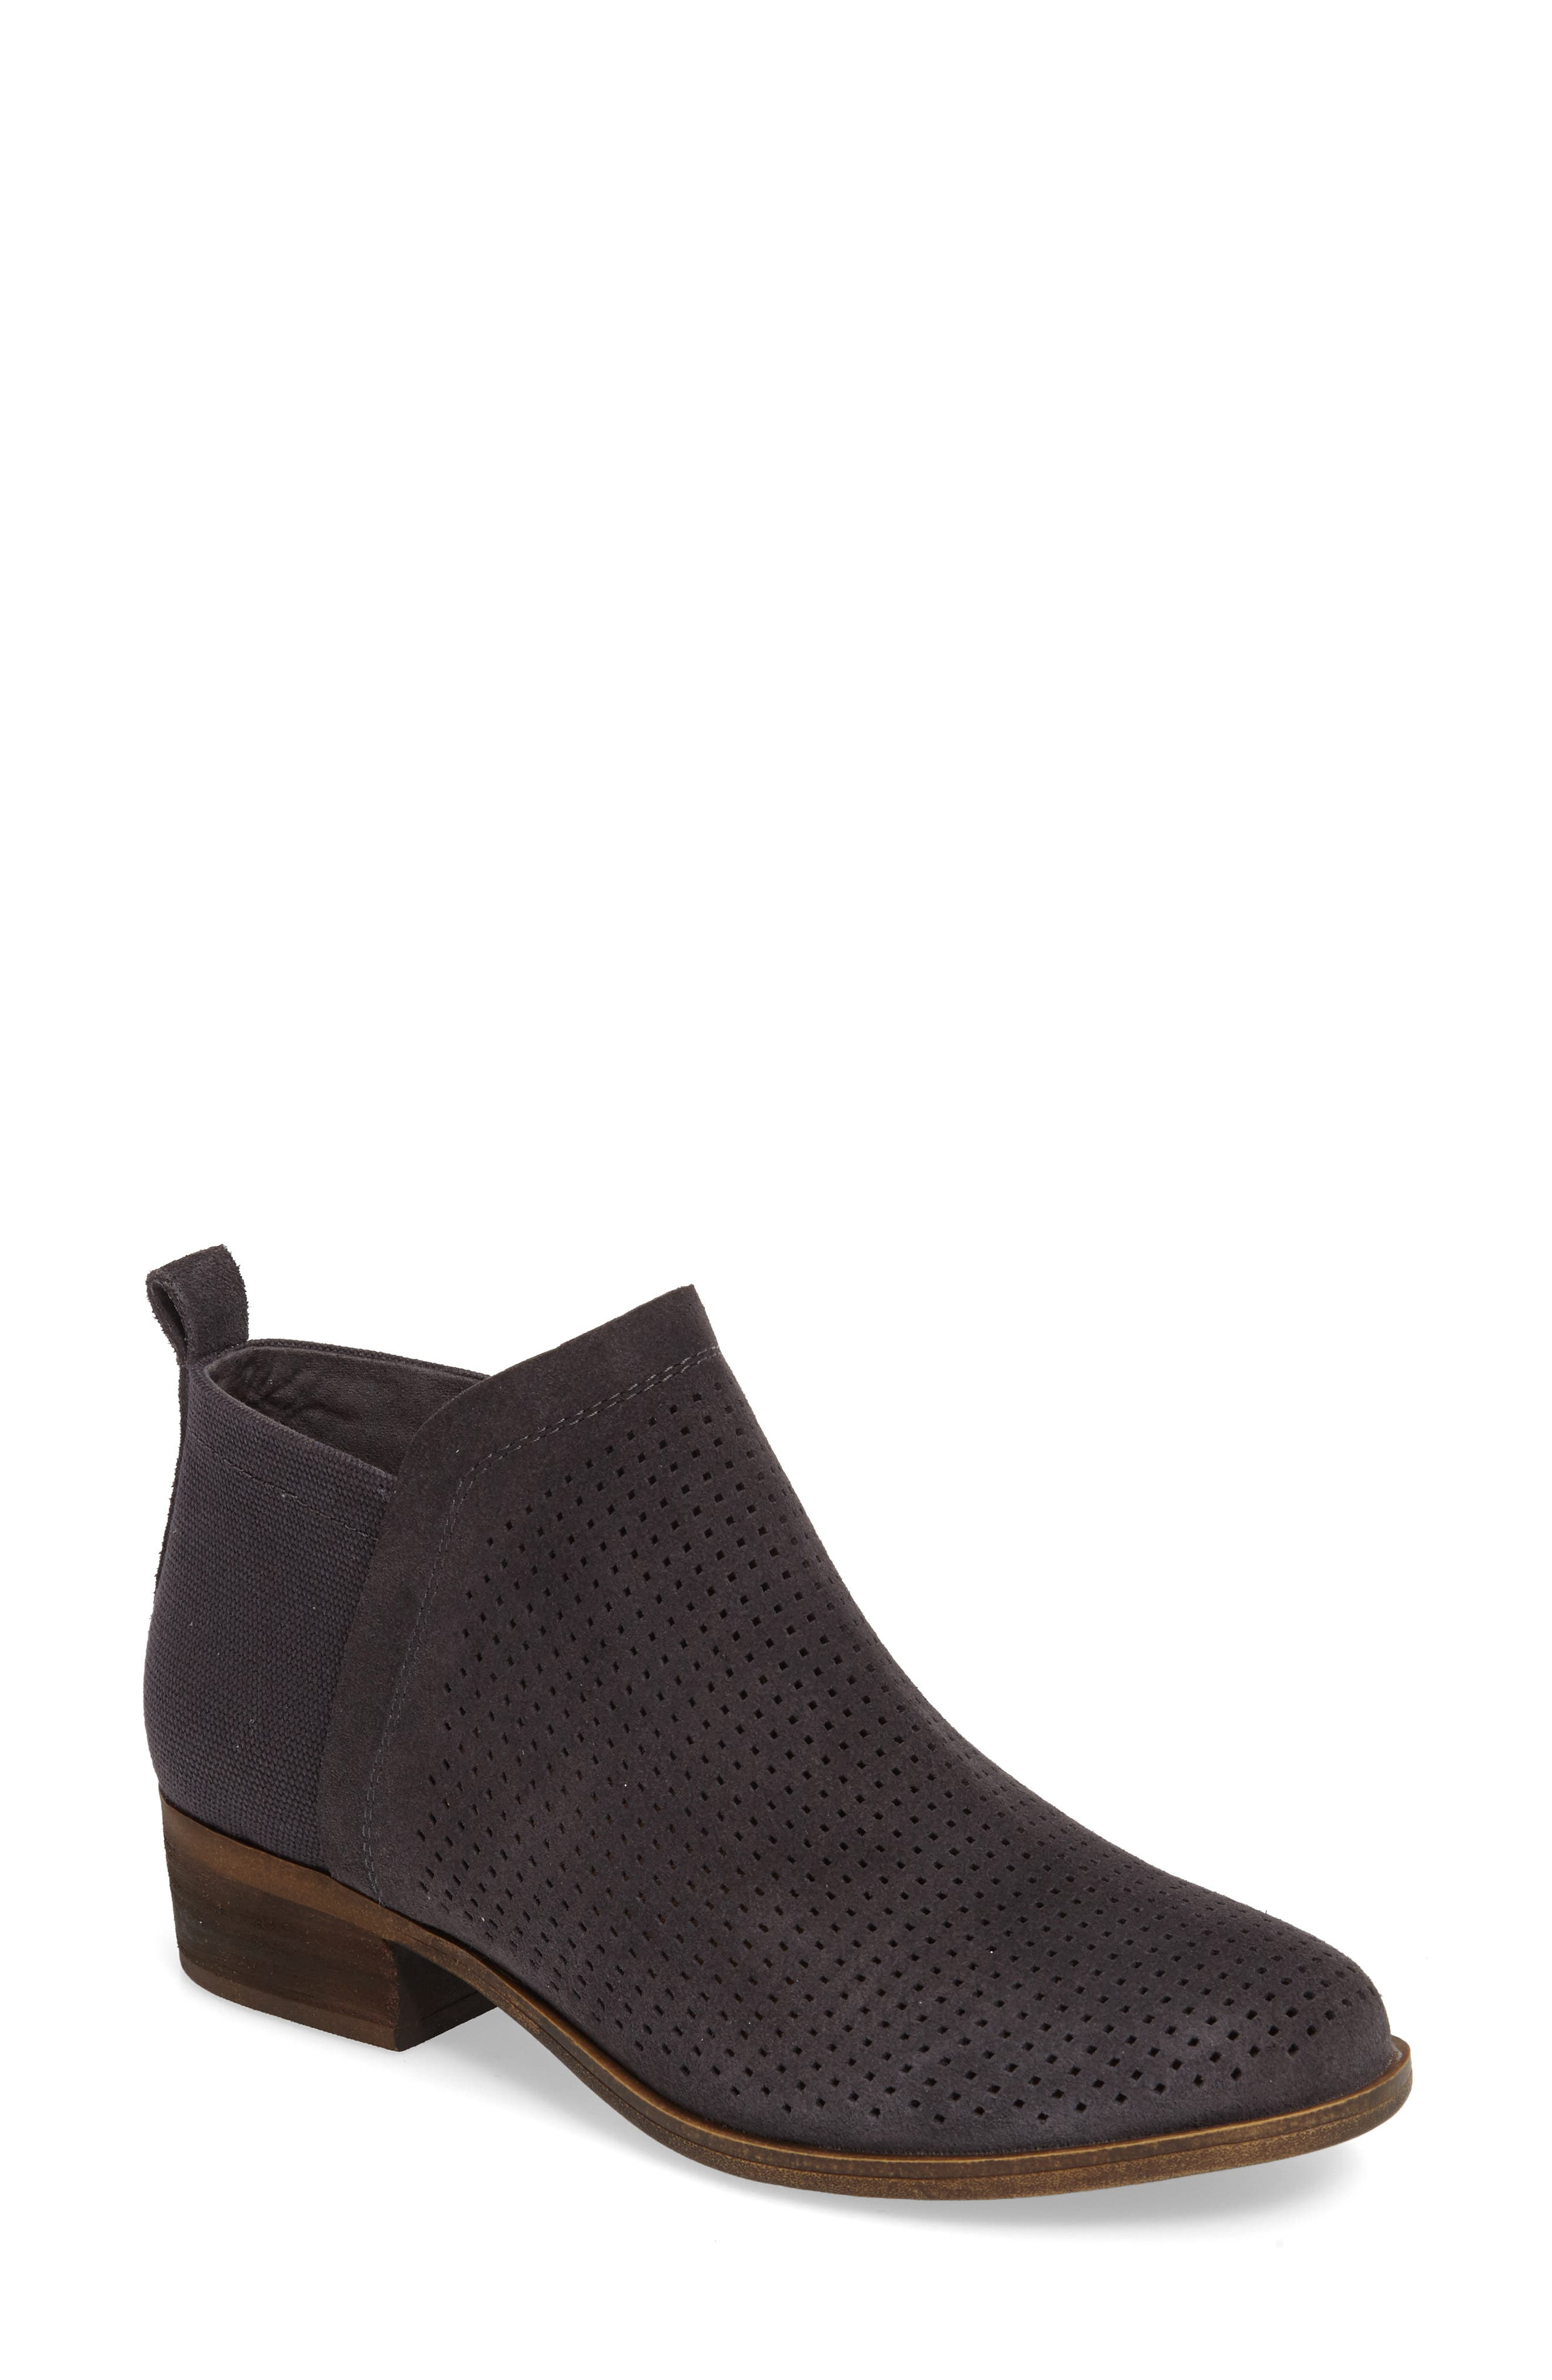 Deia Block Heel Bootie,                         Main,                         color, Forged Iron Suede